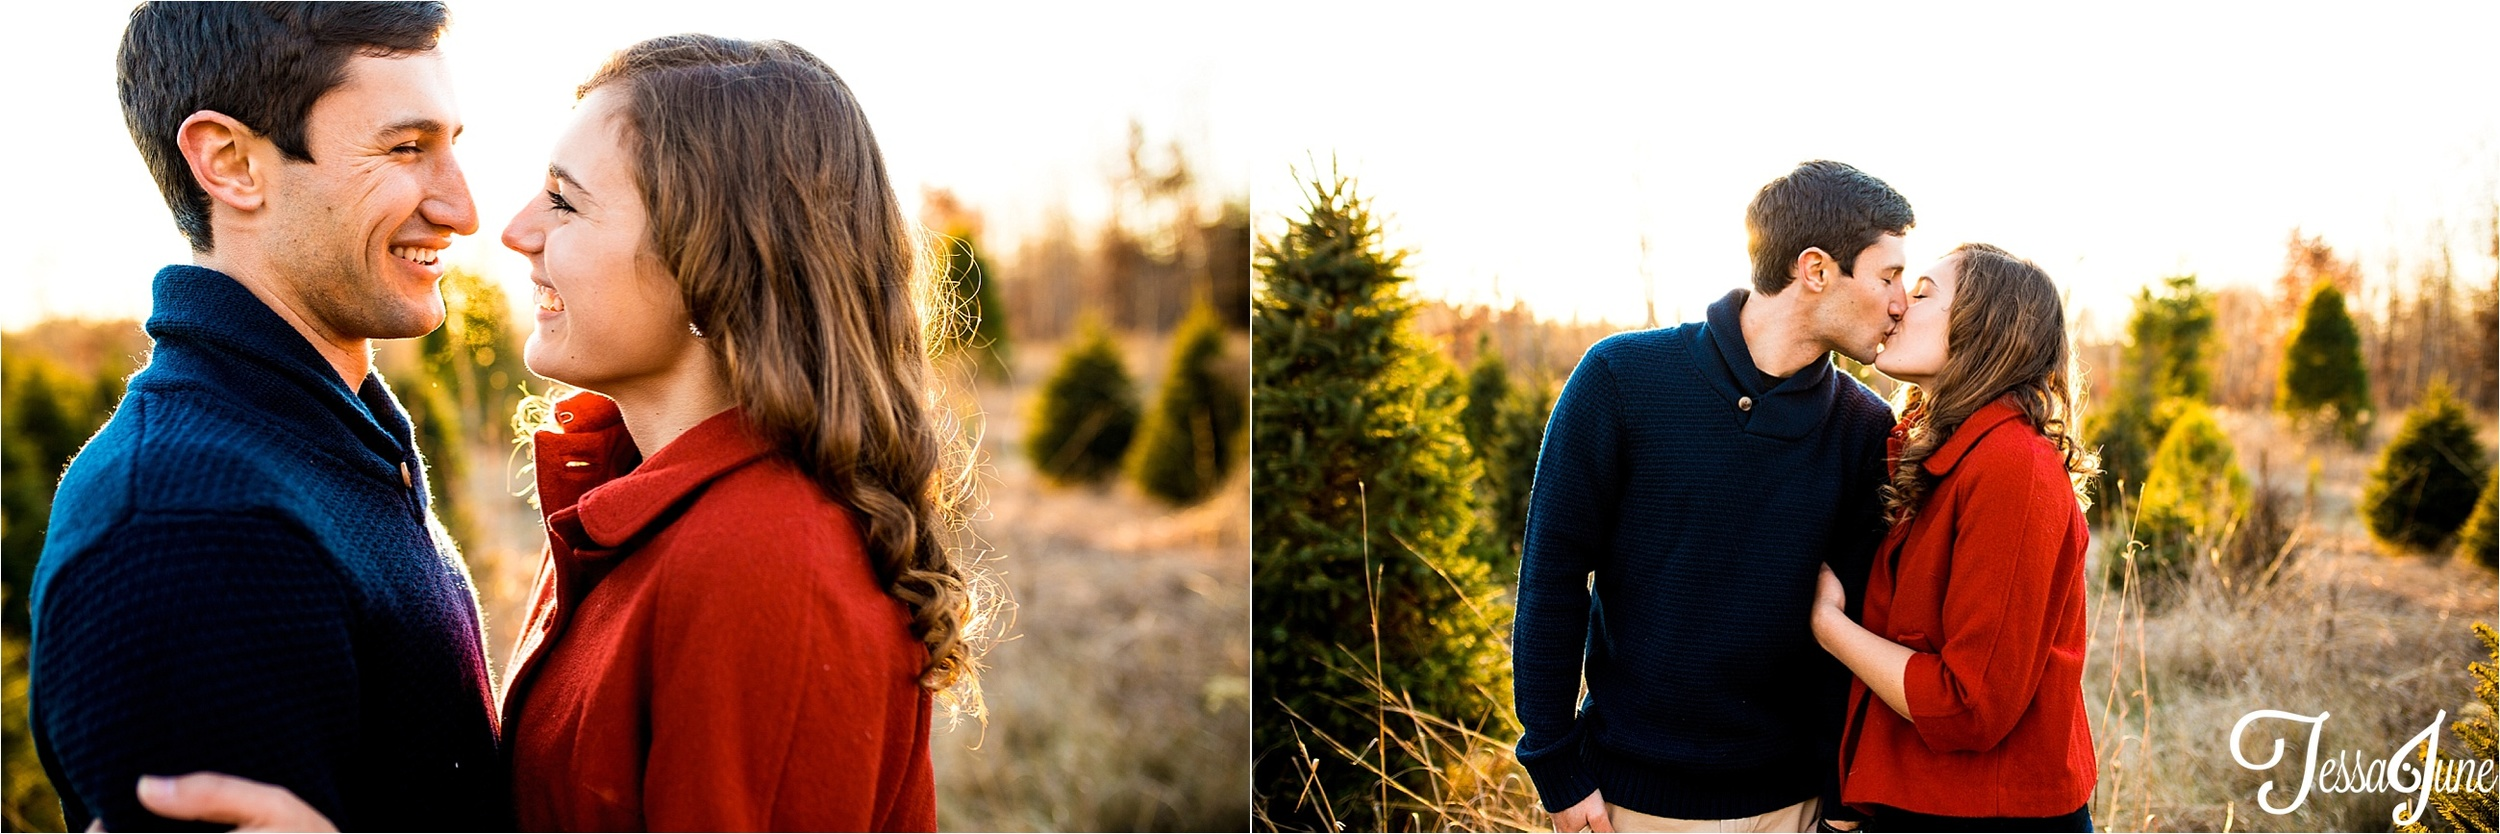 st-cloud-photography-engagement-christmas-tree-farm-winter